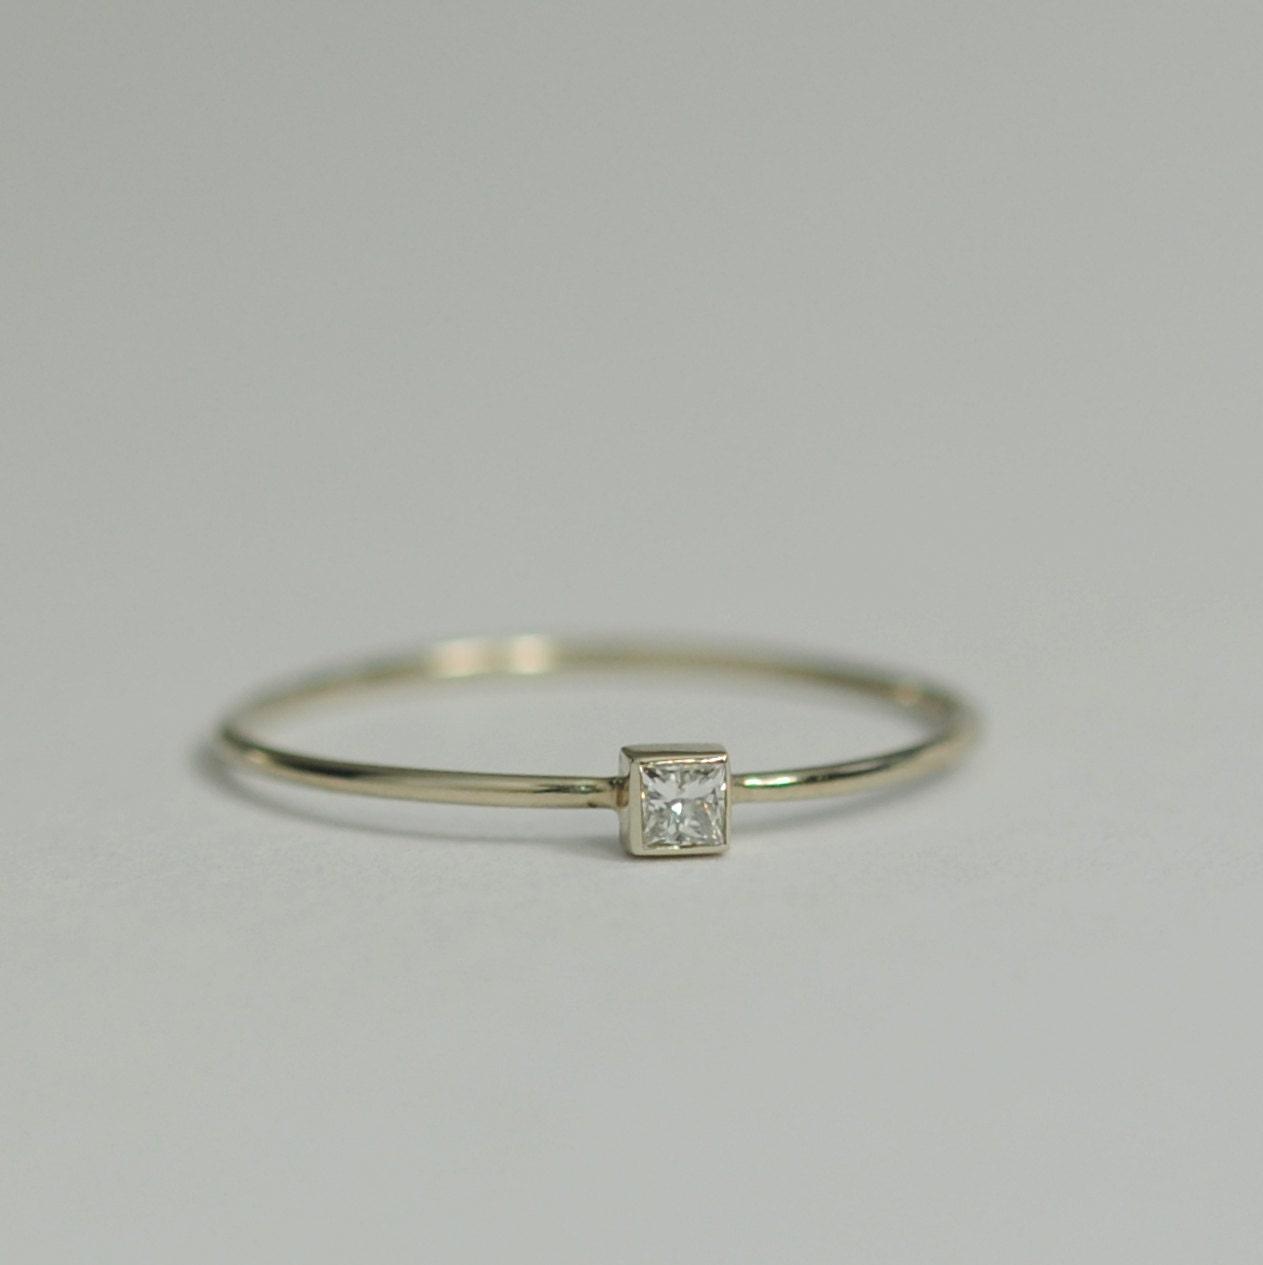 Diamond Engagement Ring 05 Carat Square Diamond 2mm By Bellaflor